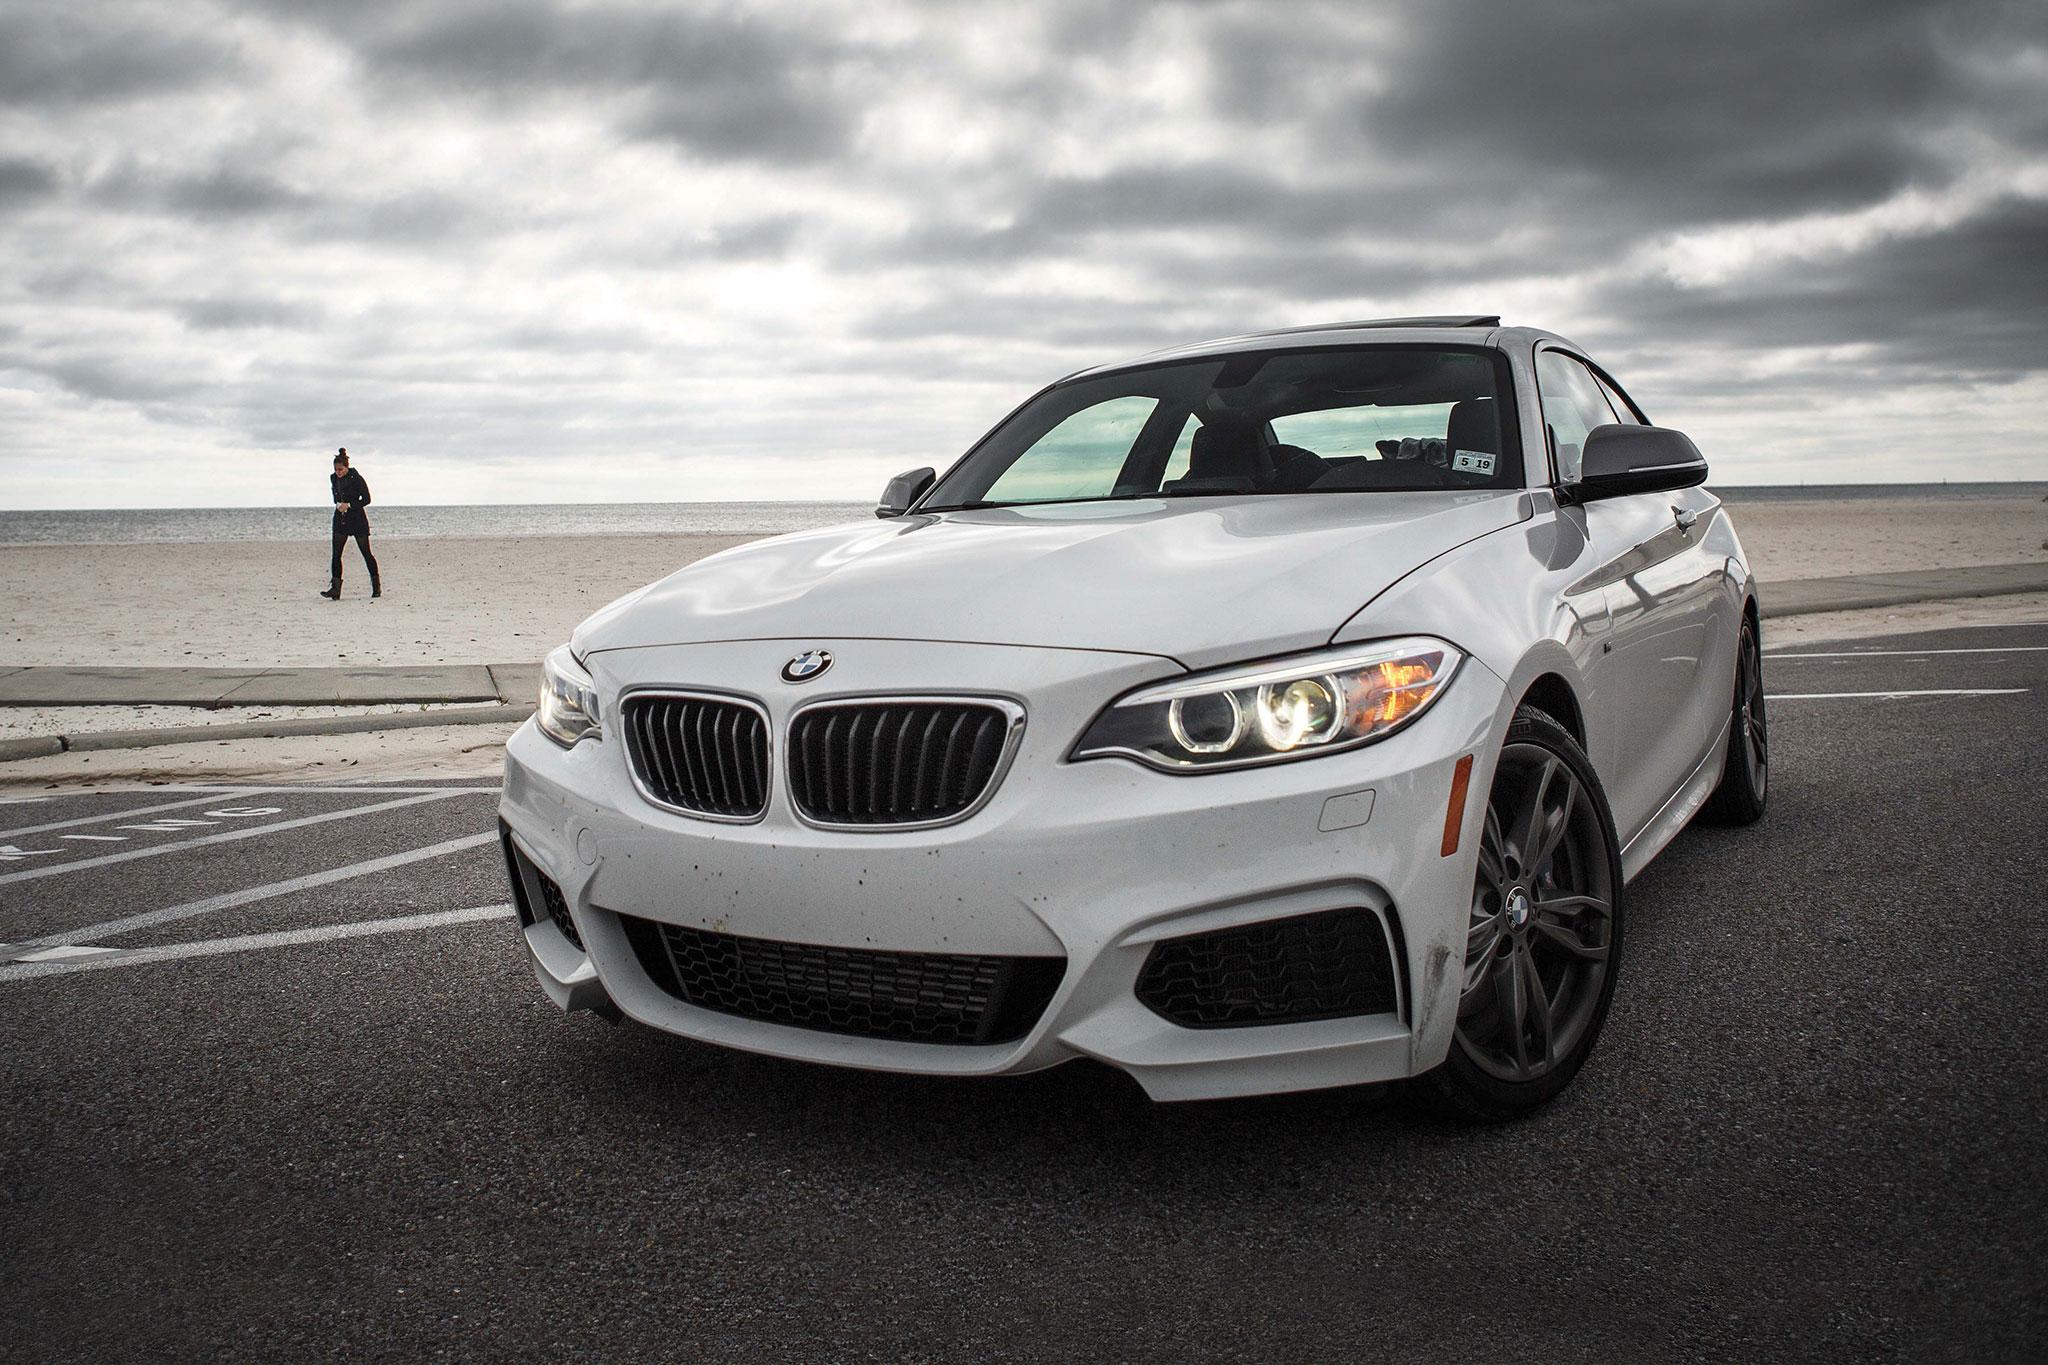 2014 BMW M235i Front Three Quarter